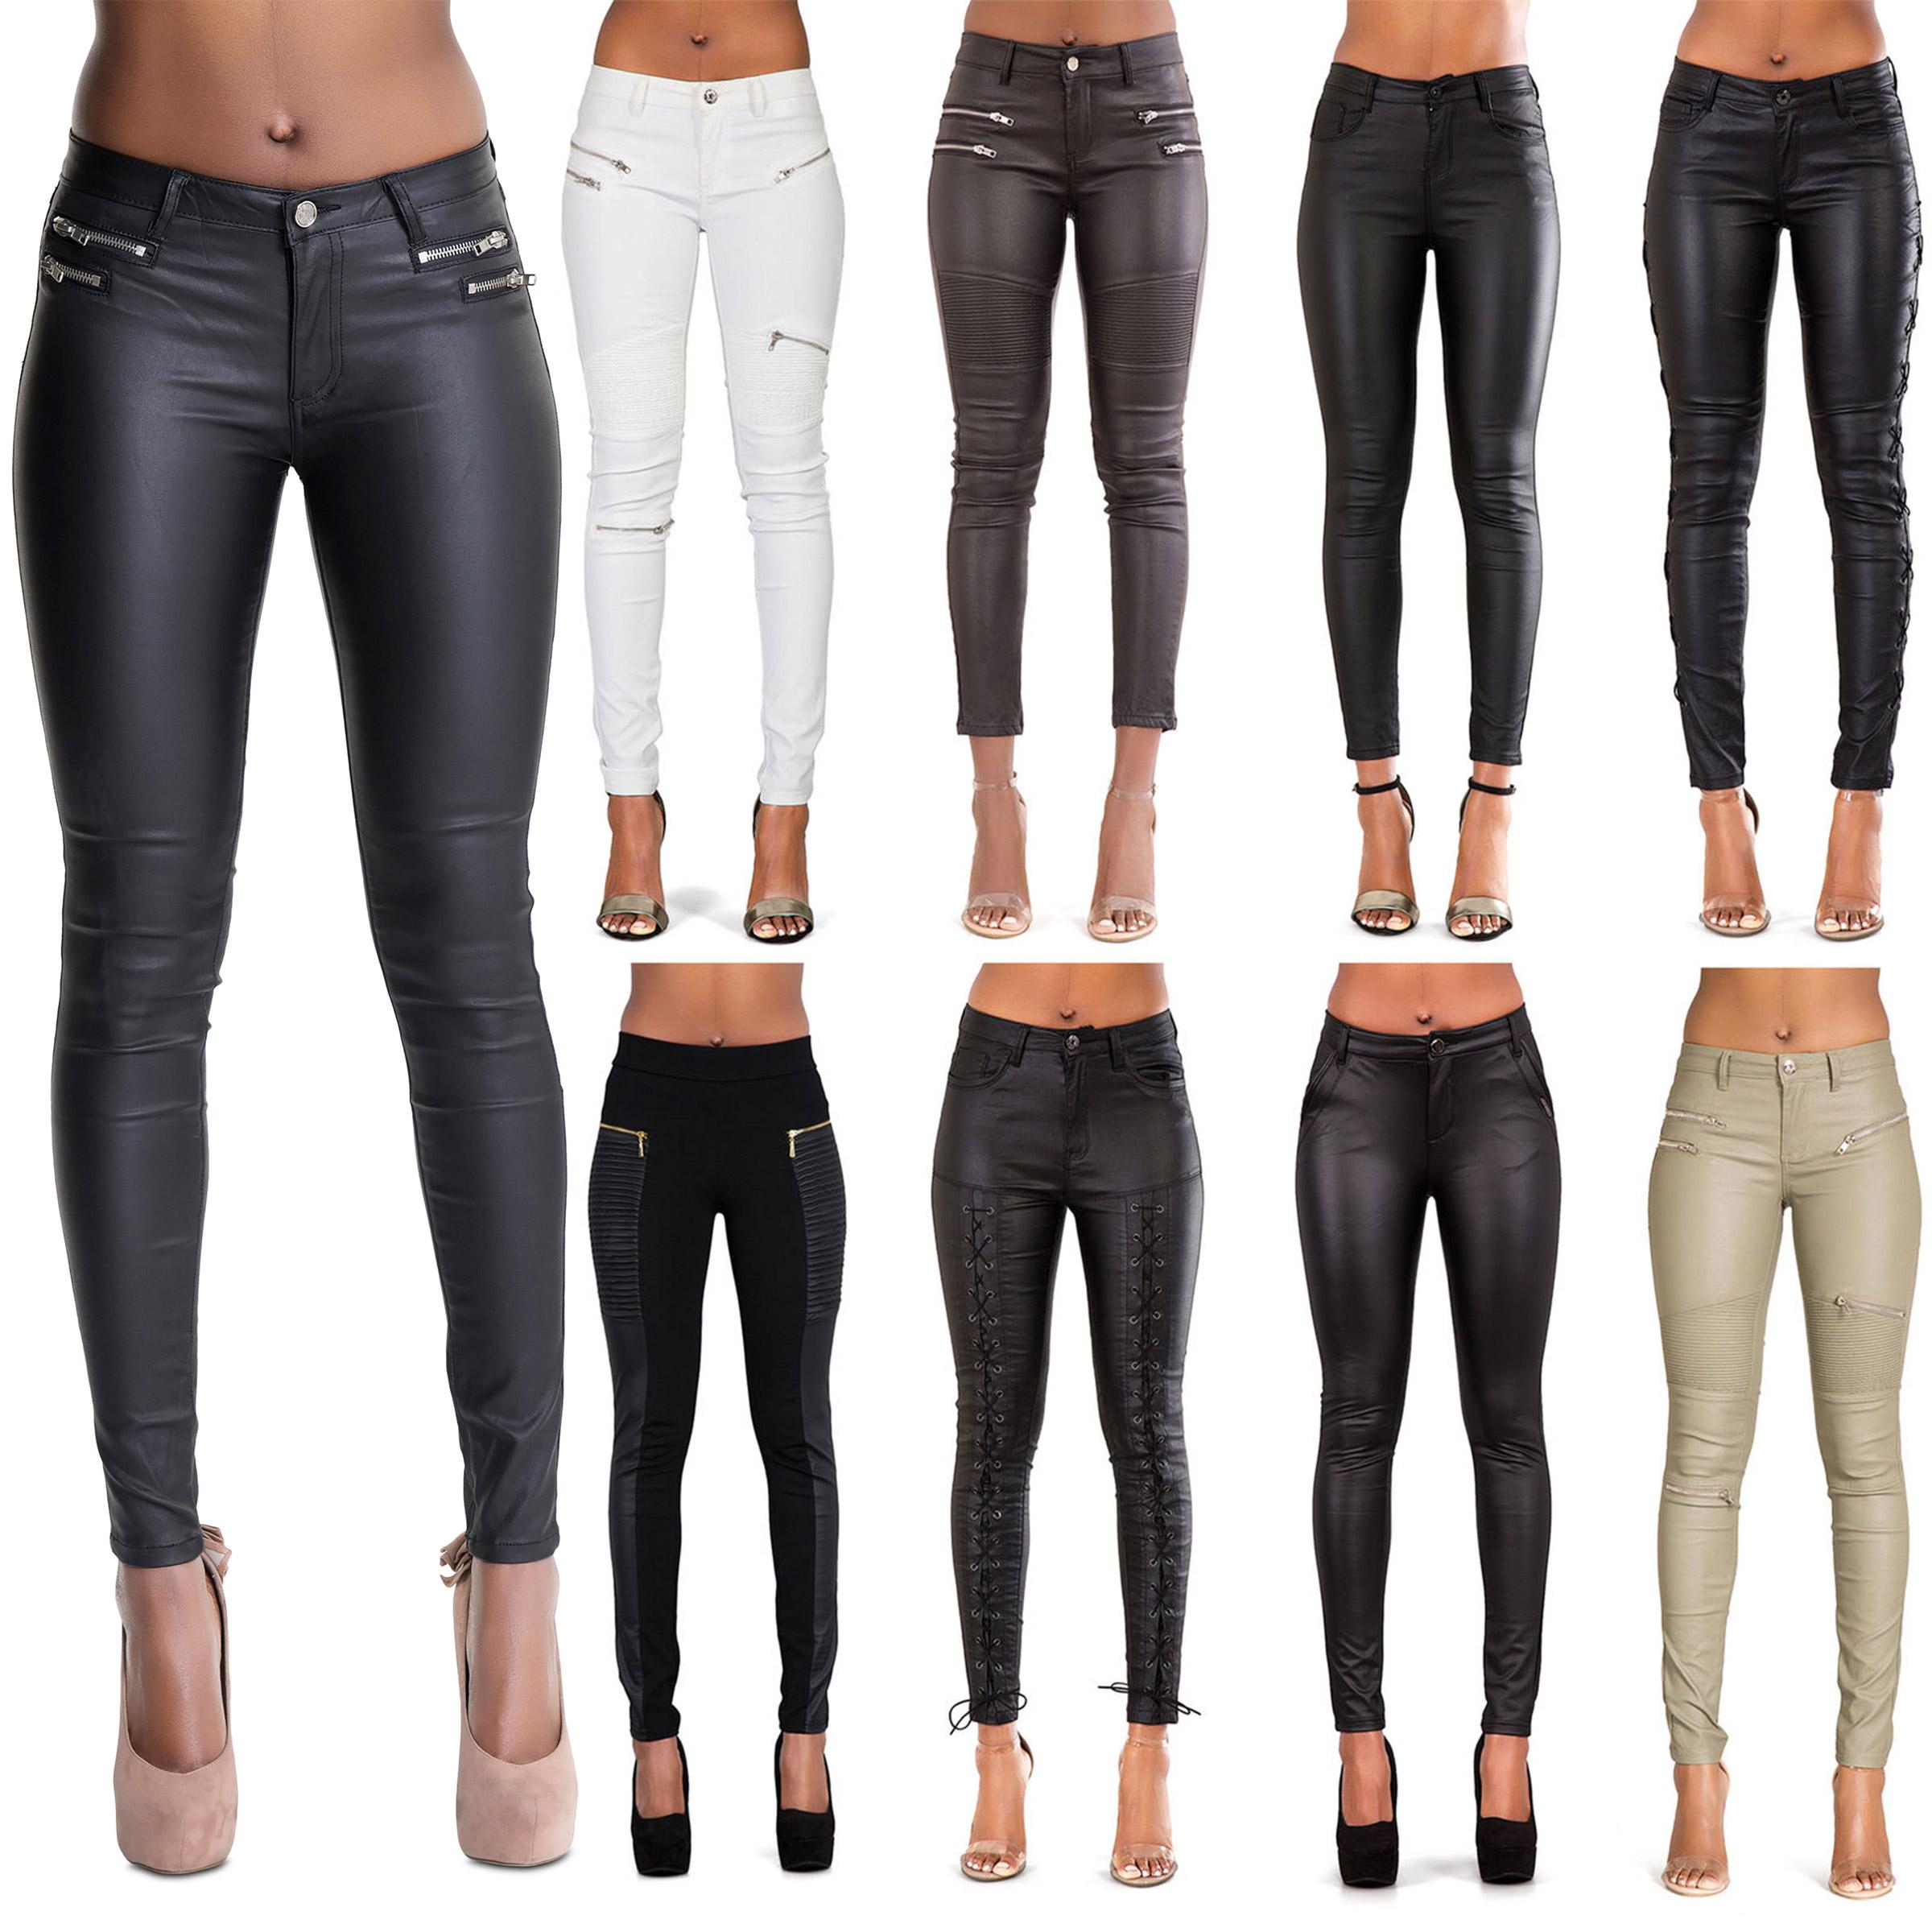 fbd0ad57dc2 WOMEN LEATHER LOOK LEGGINGS TROUSERS BLACK WET LOOK JEANS SIZE 6 8 10 12 14  16